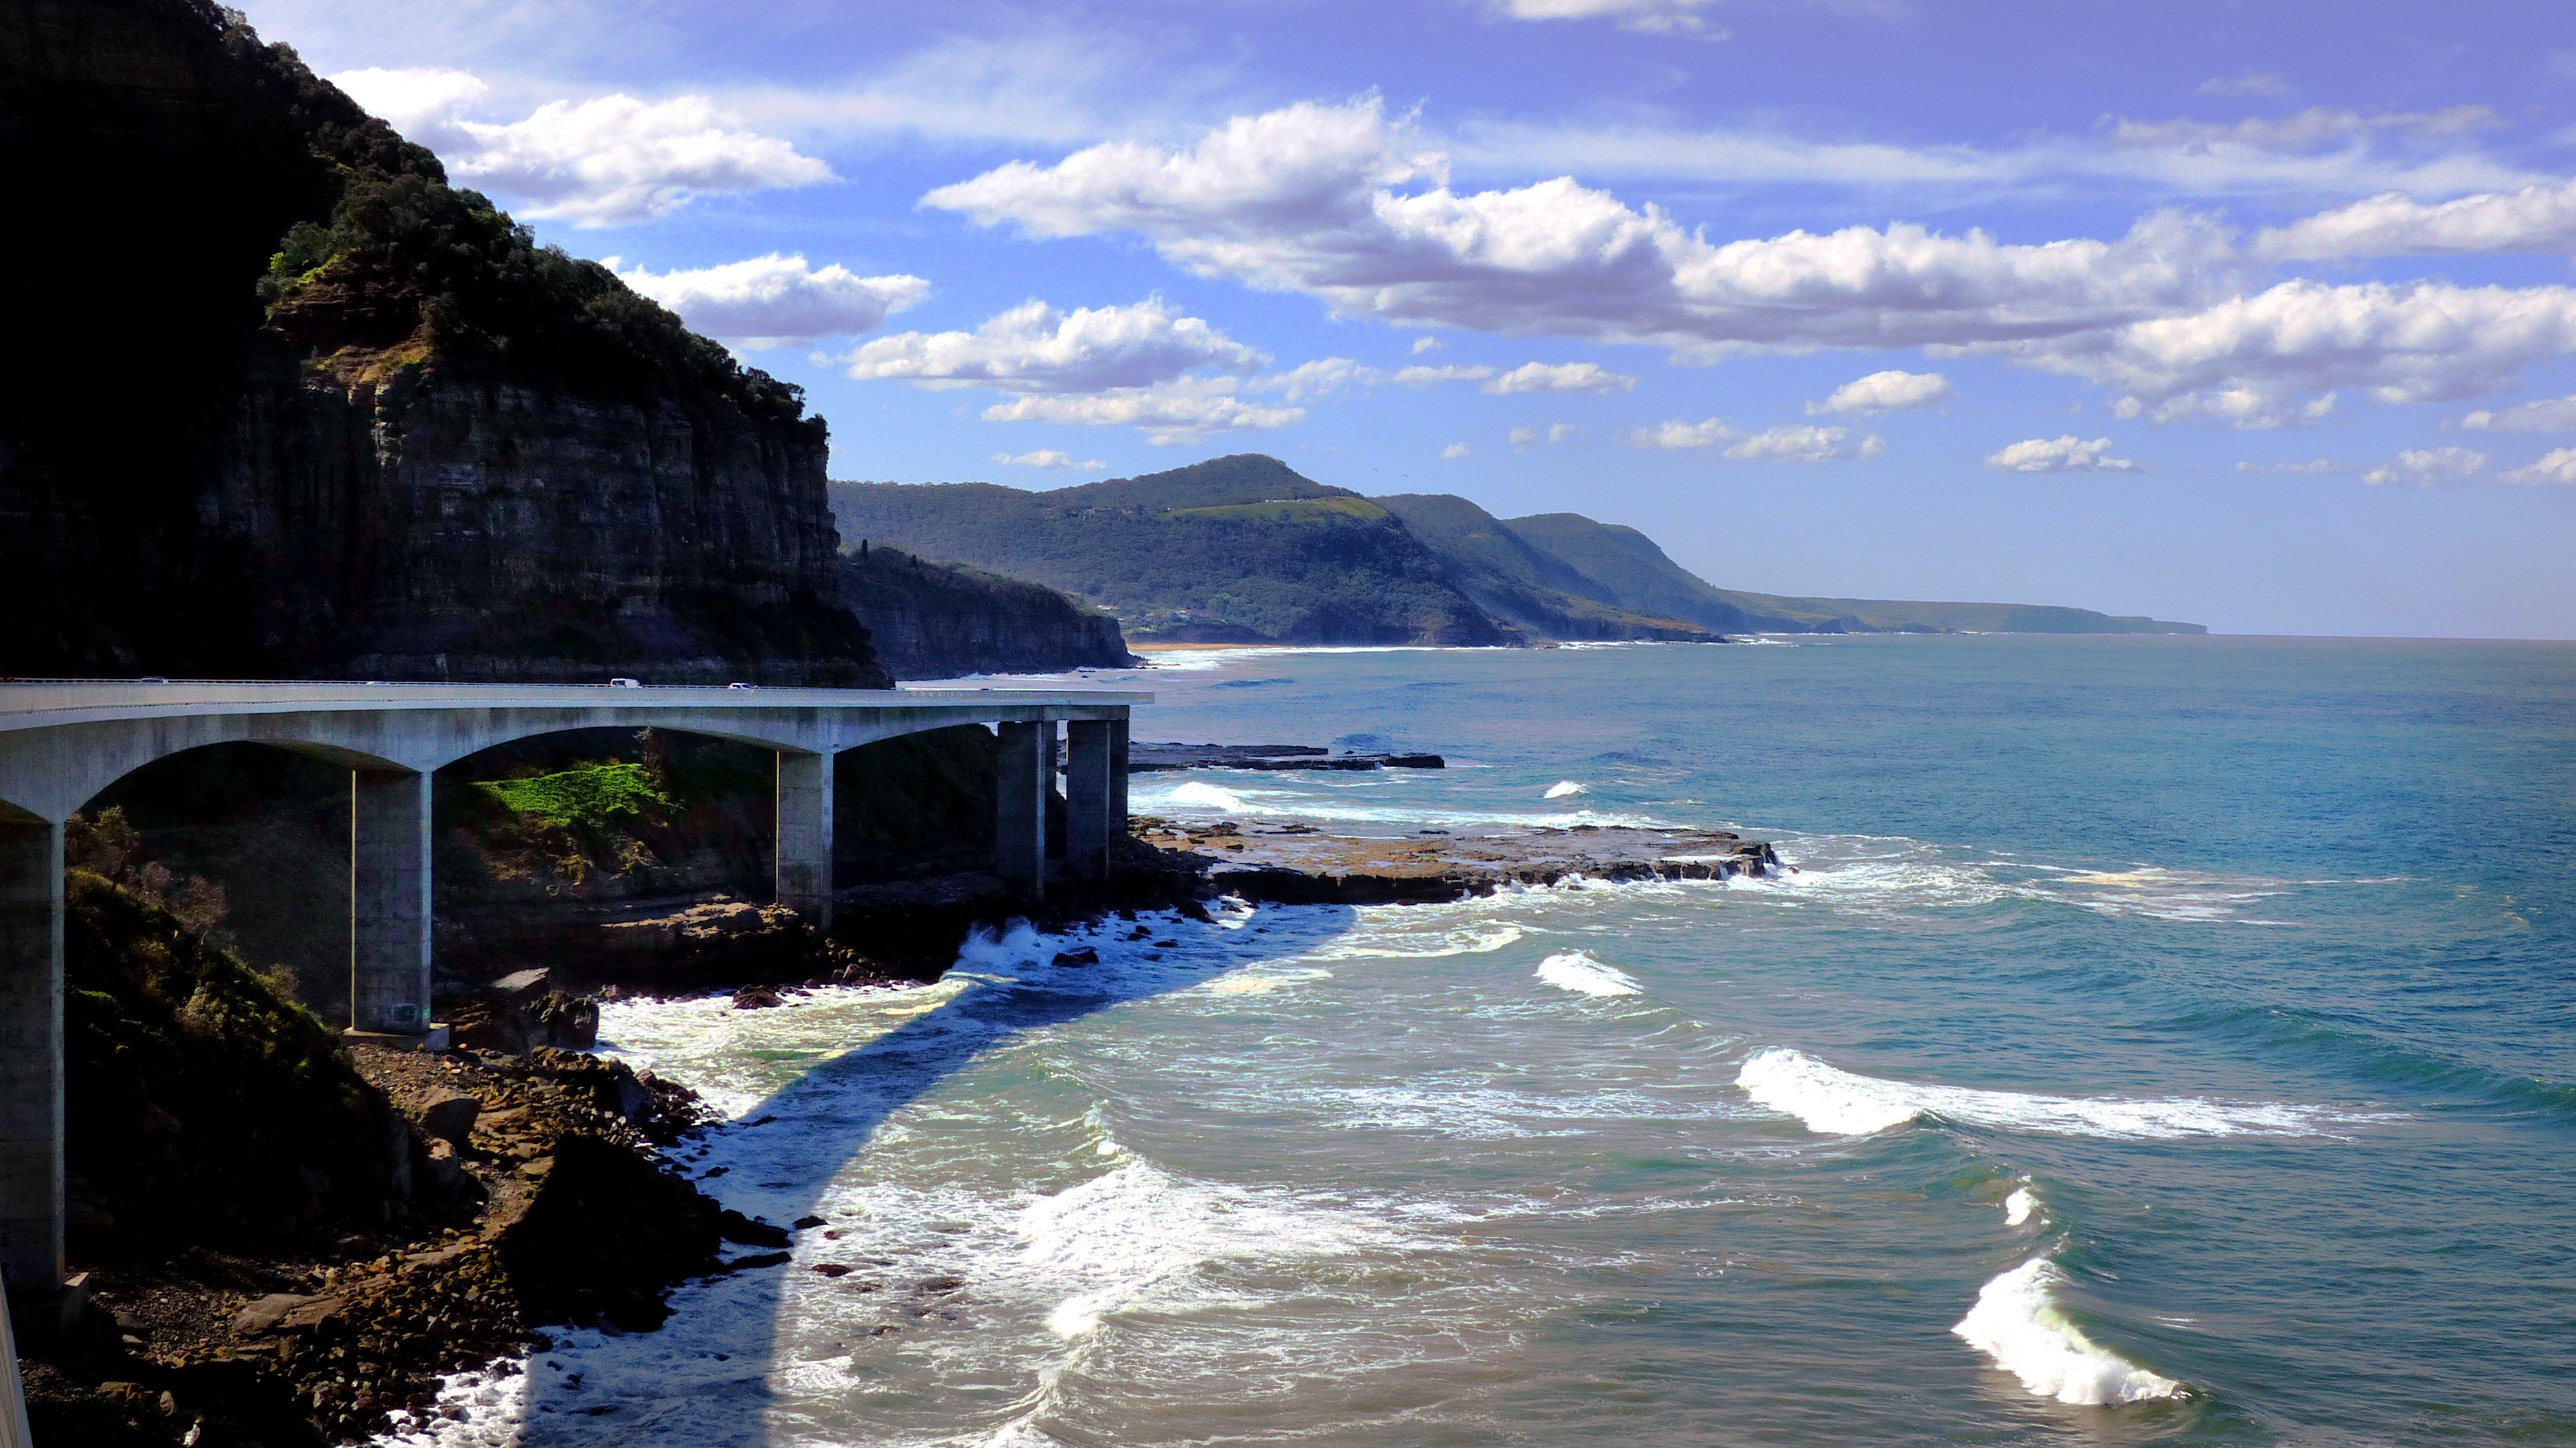 The sea cliff bridge. nsw aust. photo